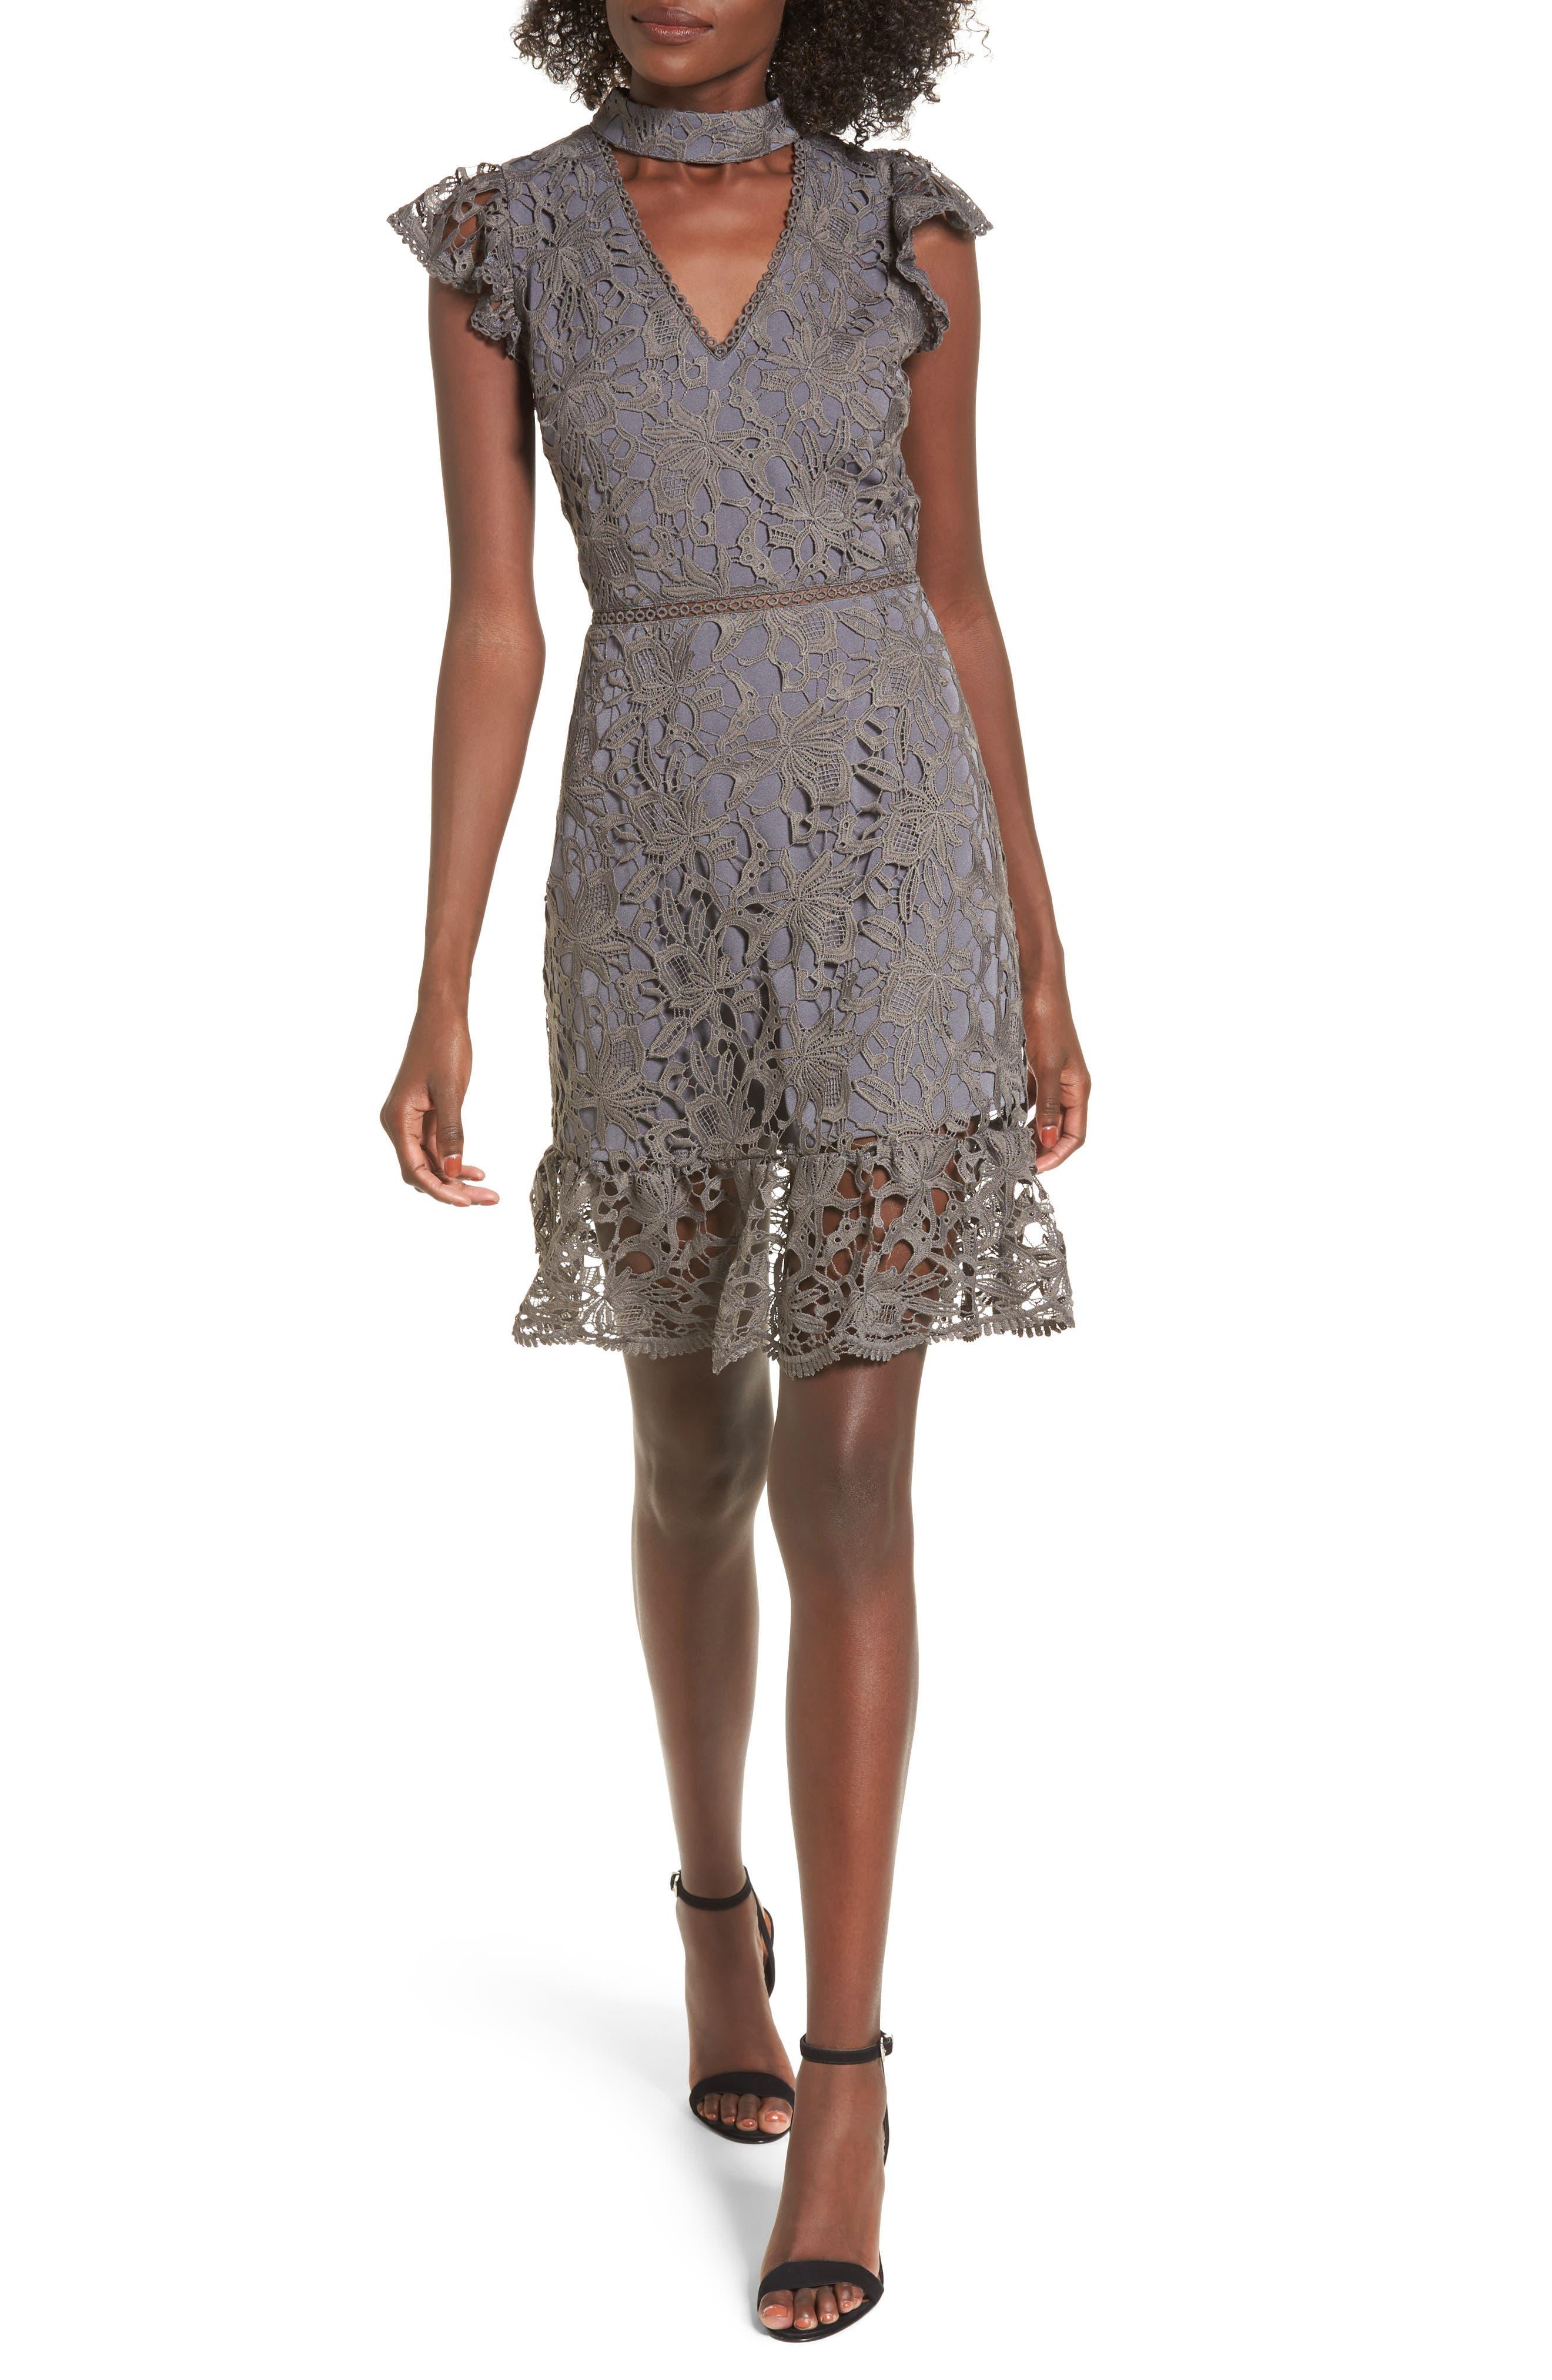 Alternate Image 1 Selected - J.O.A. Choker Lace Dress